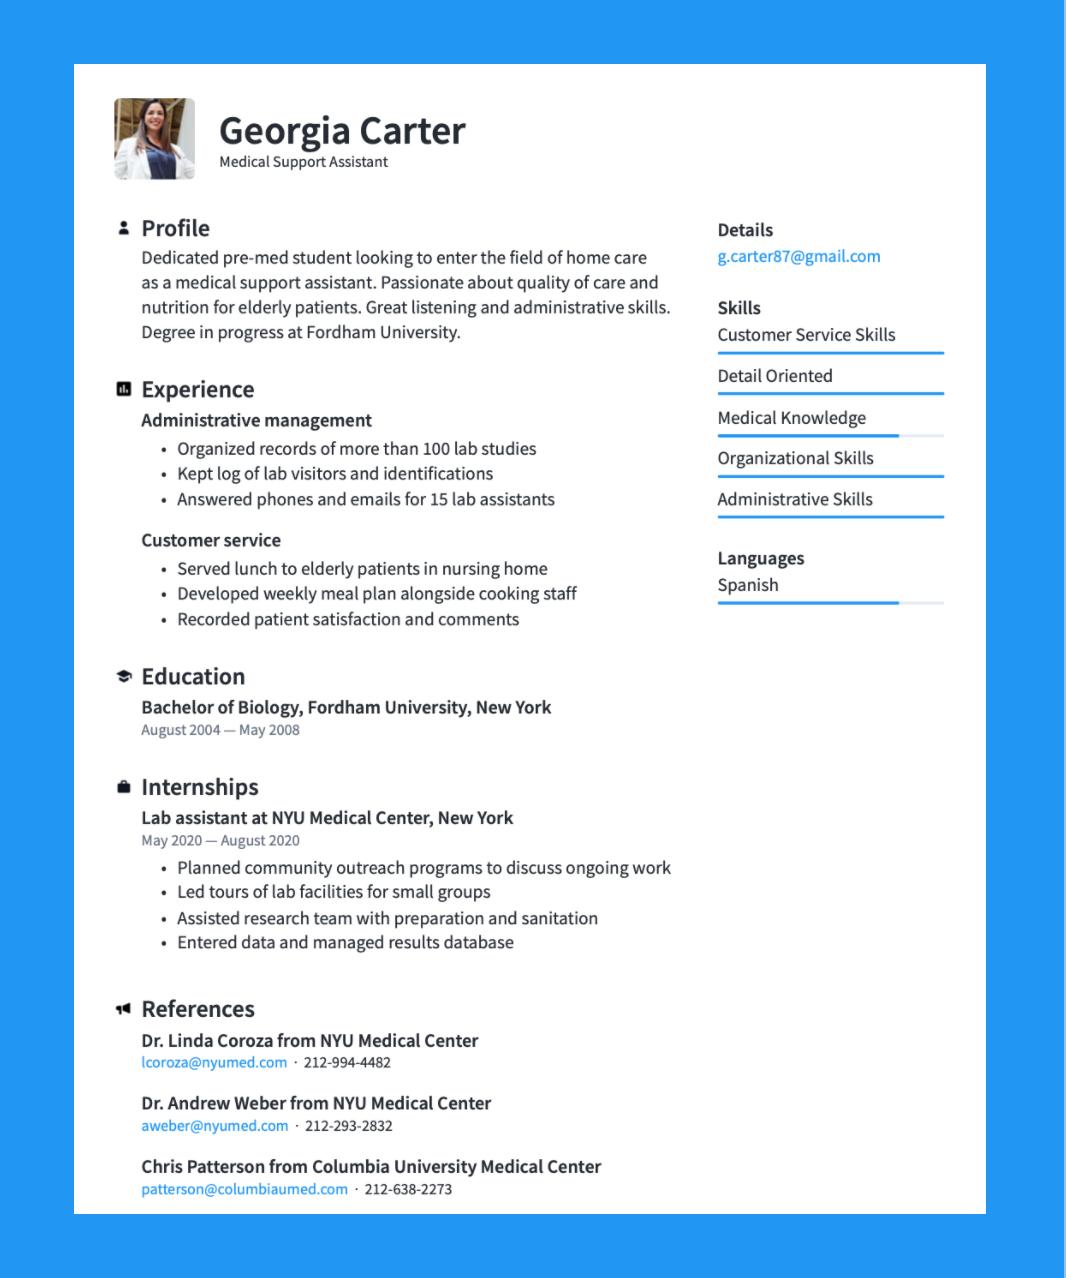 Best Resume Format 20 +Free Examples · Resume.io